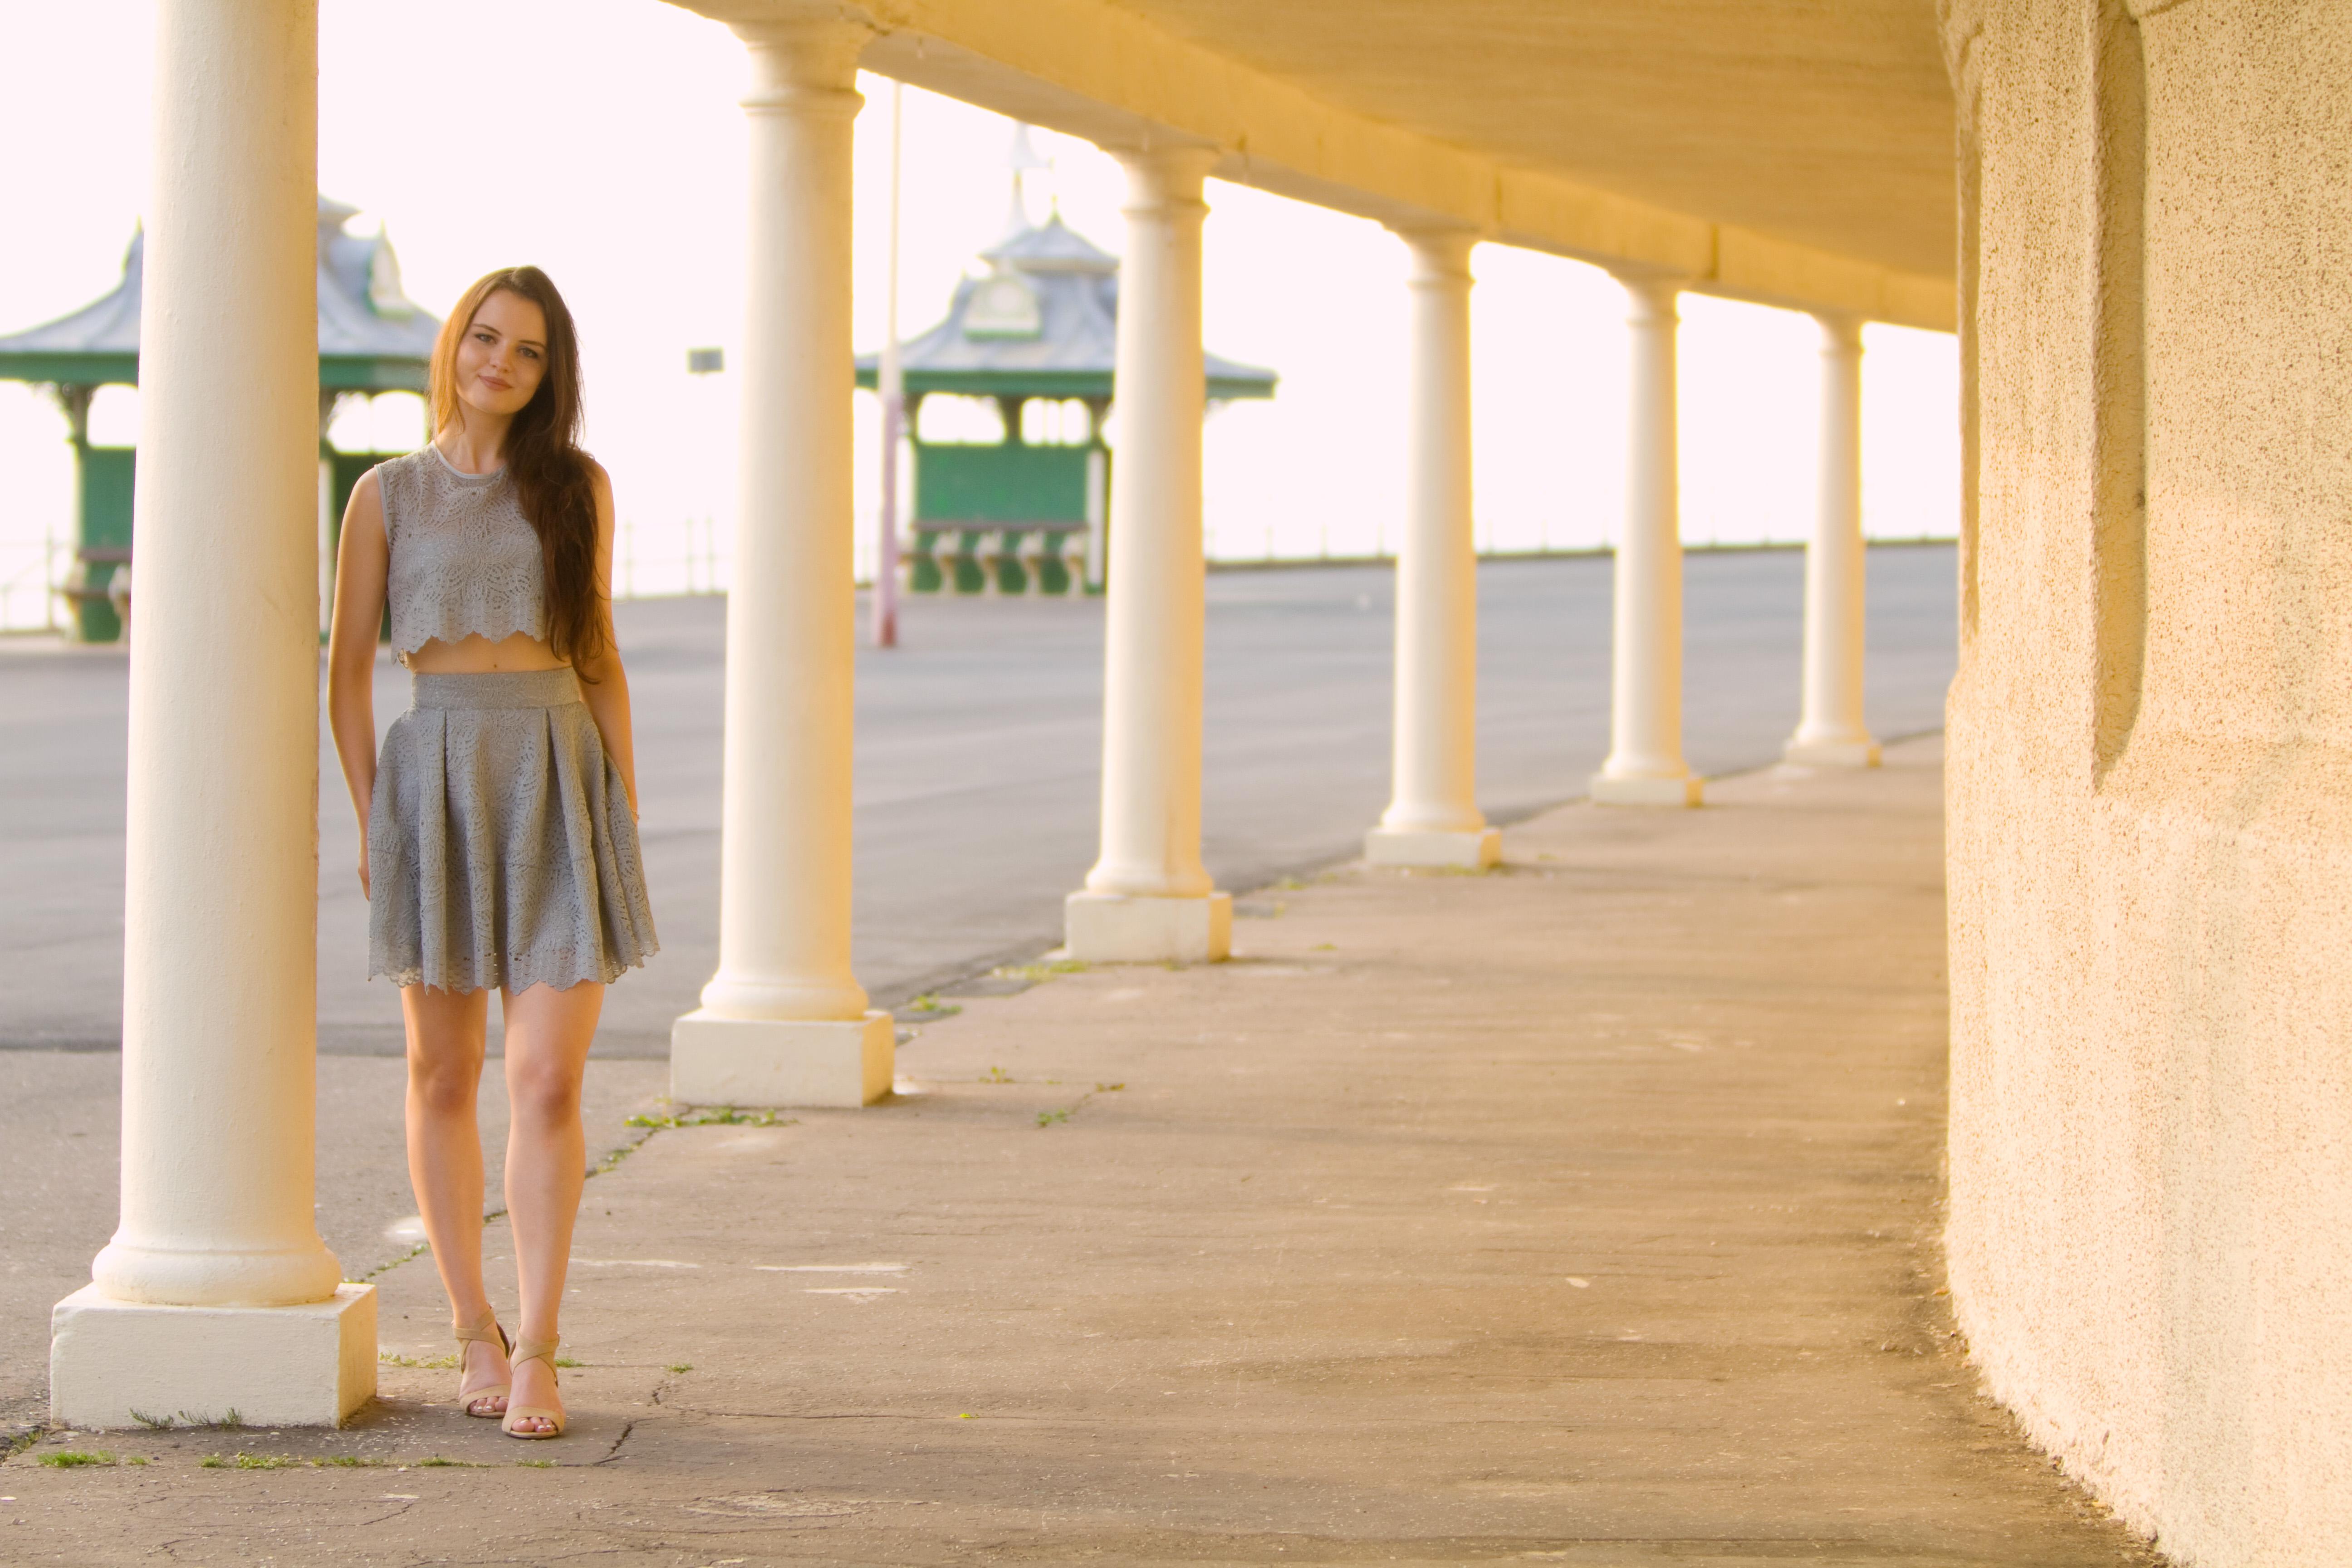 Photo shoot on Blackpool promenade, England